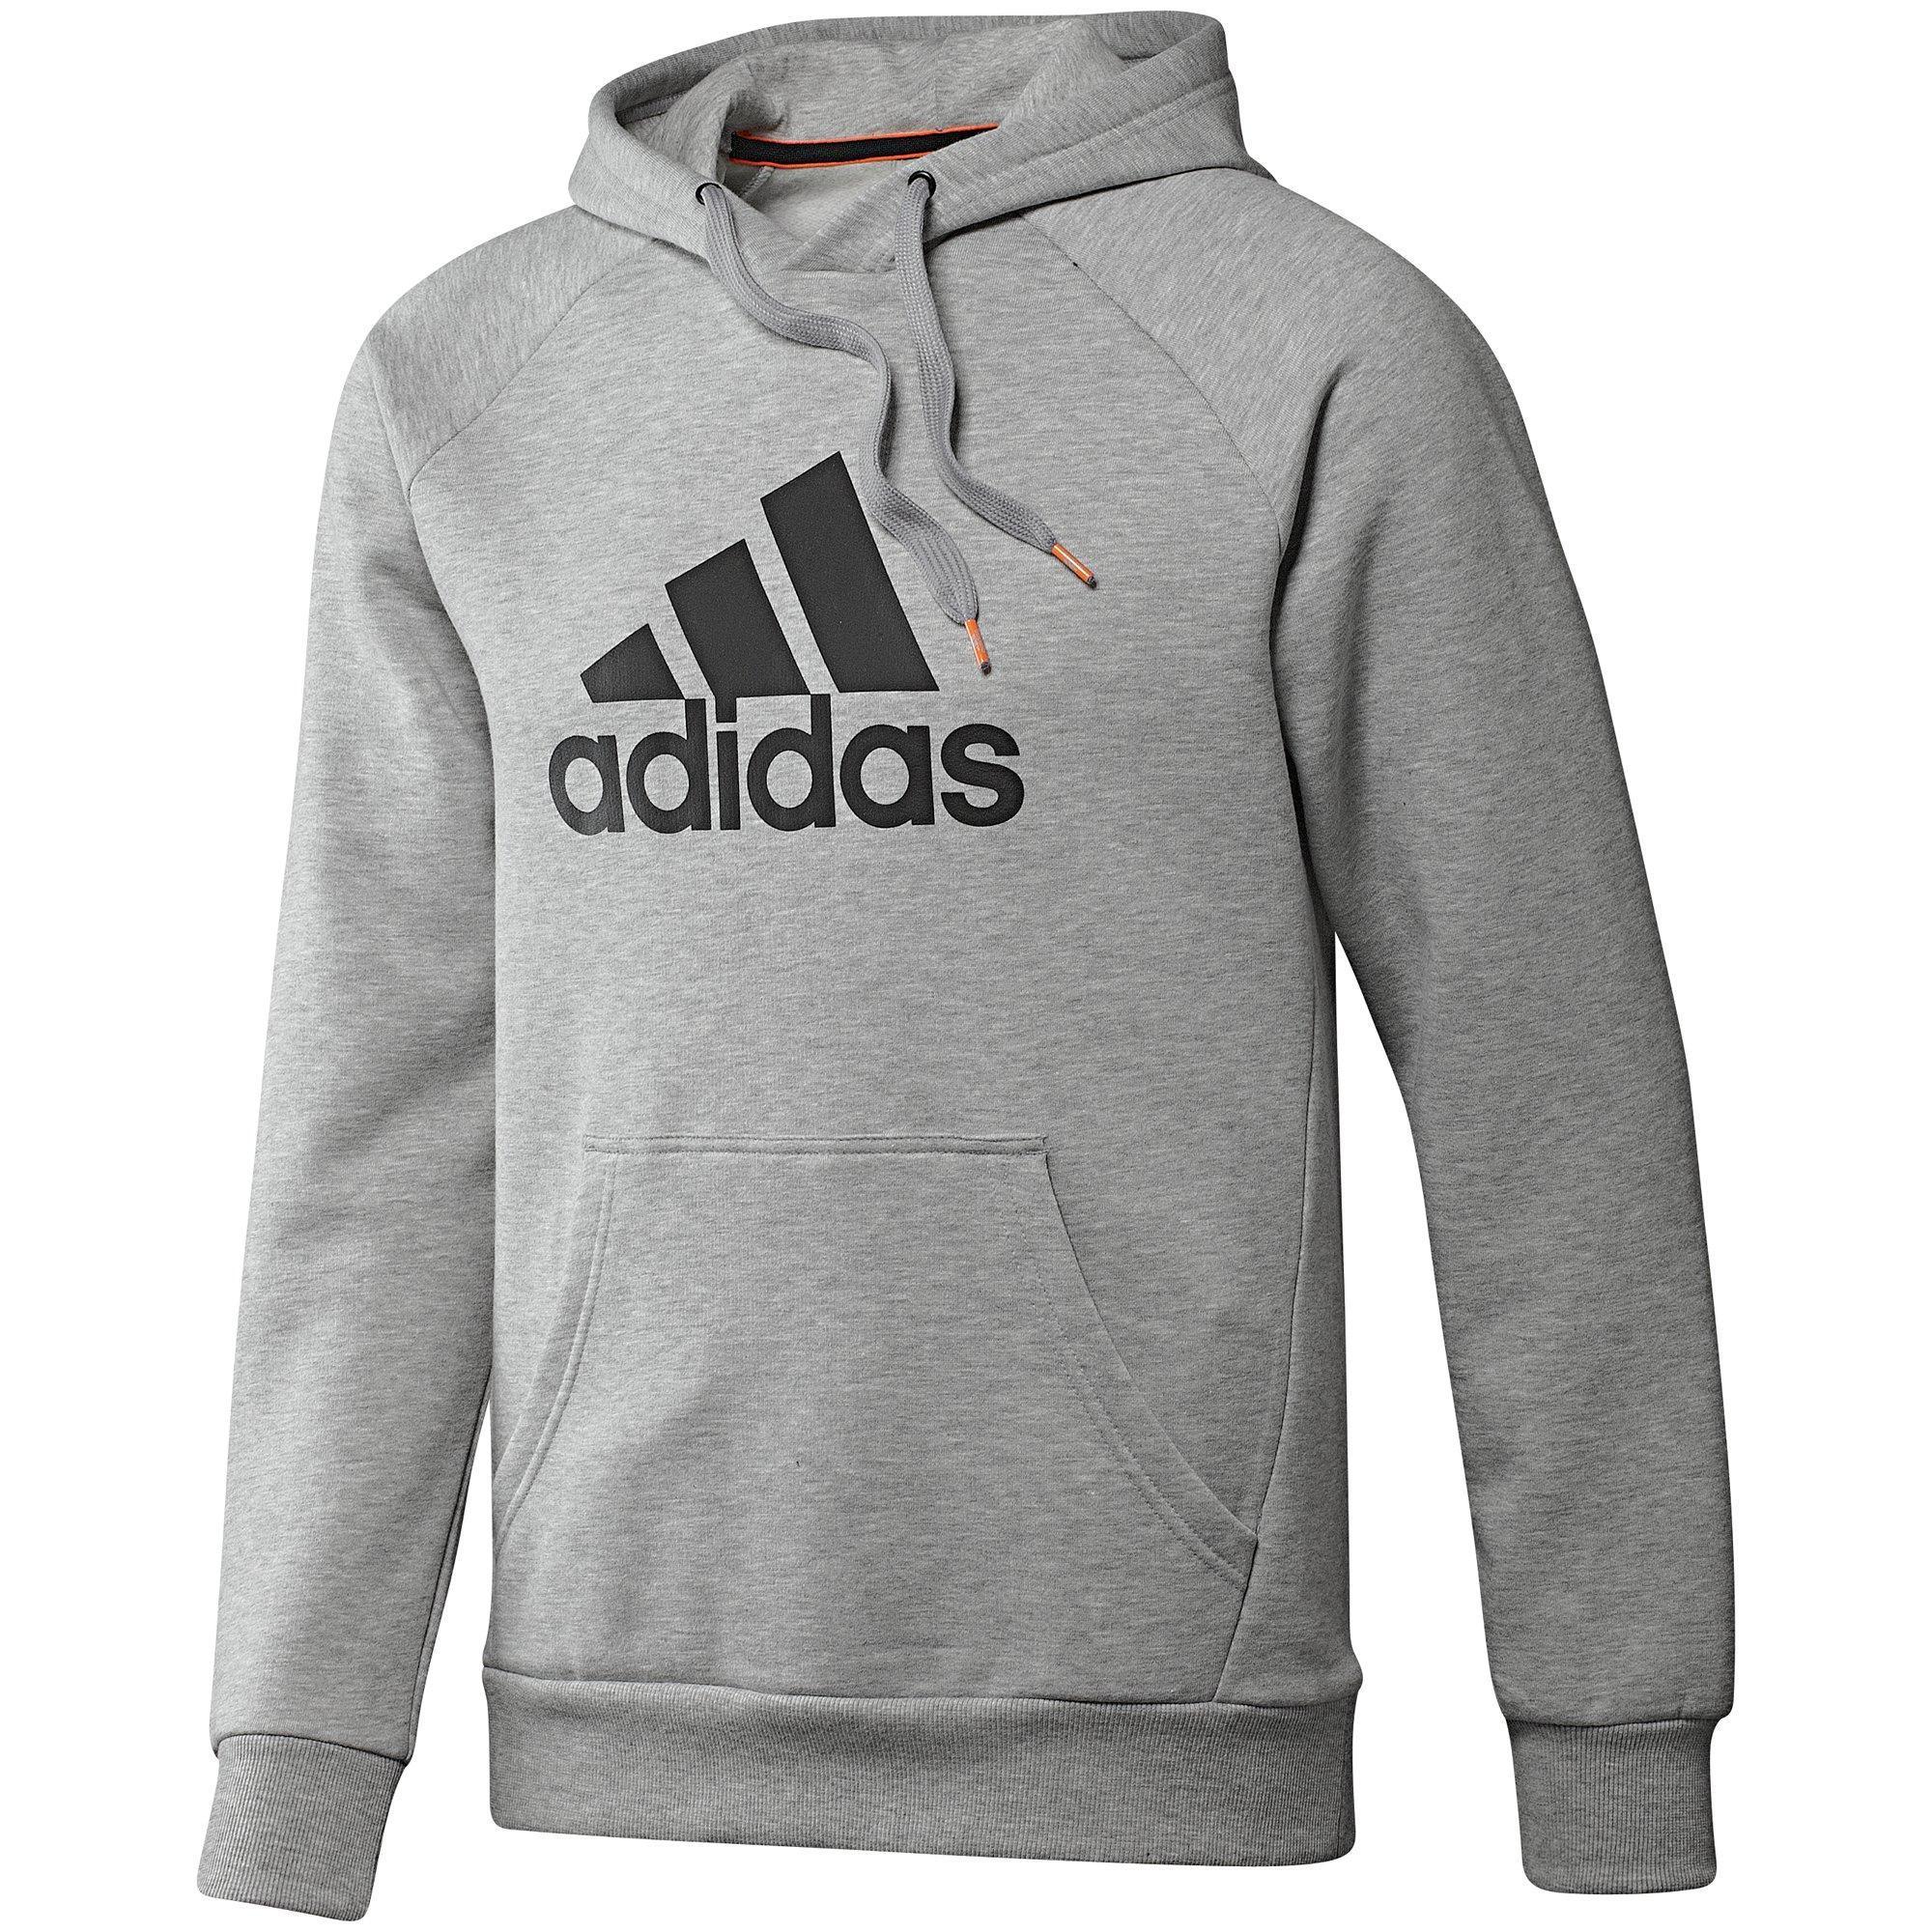 Adidas Mens Essentials Logo Hoodie - Medium Grey Heather